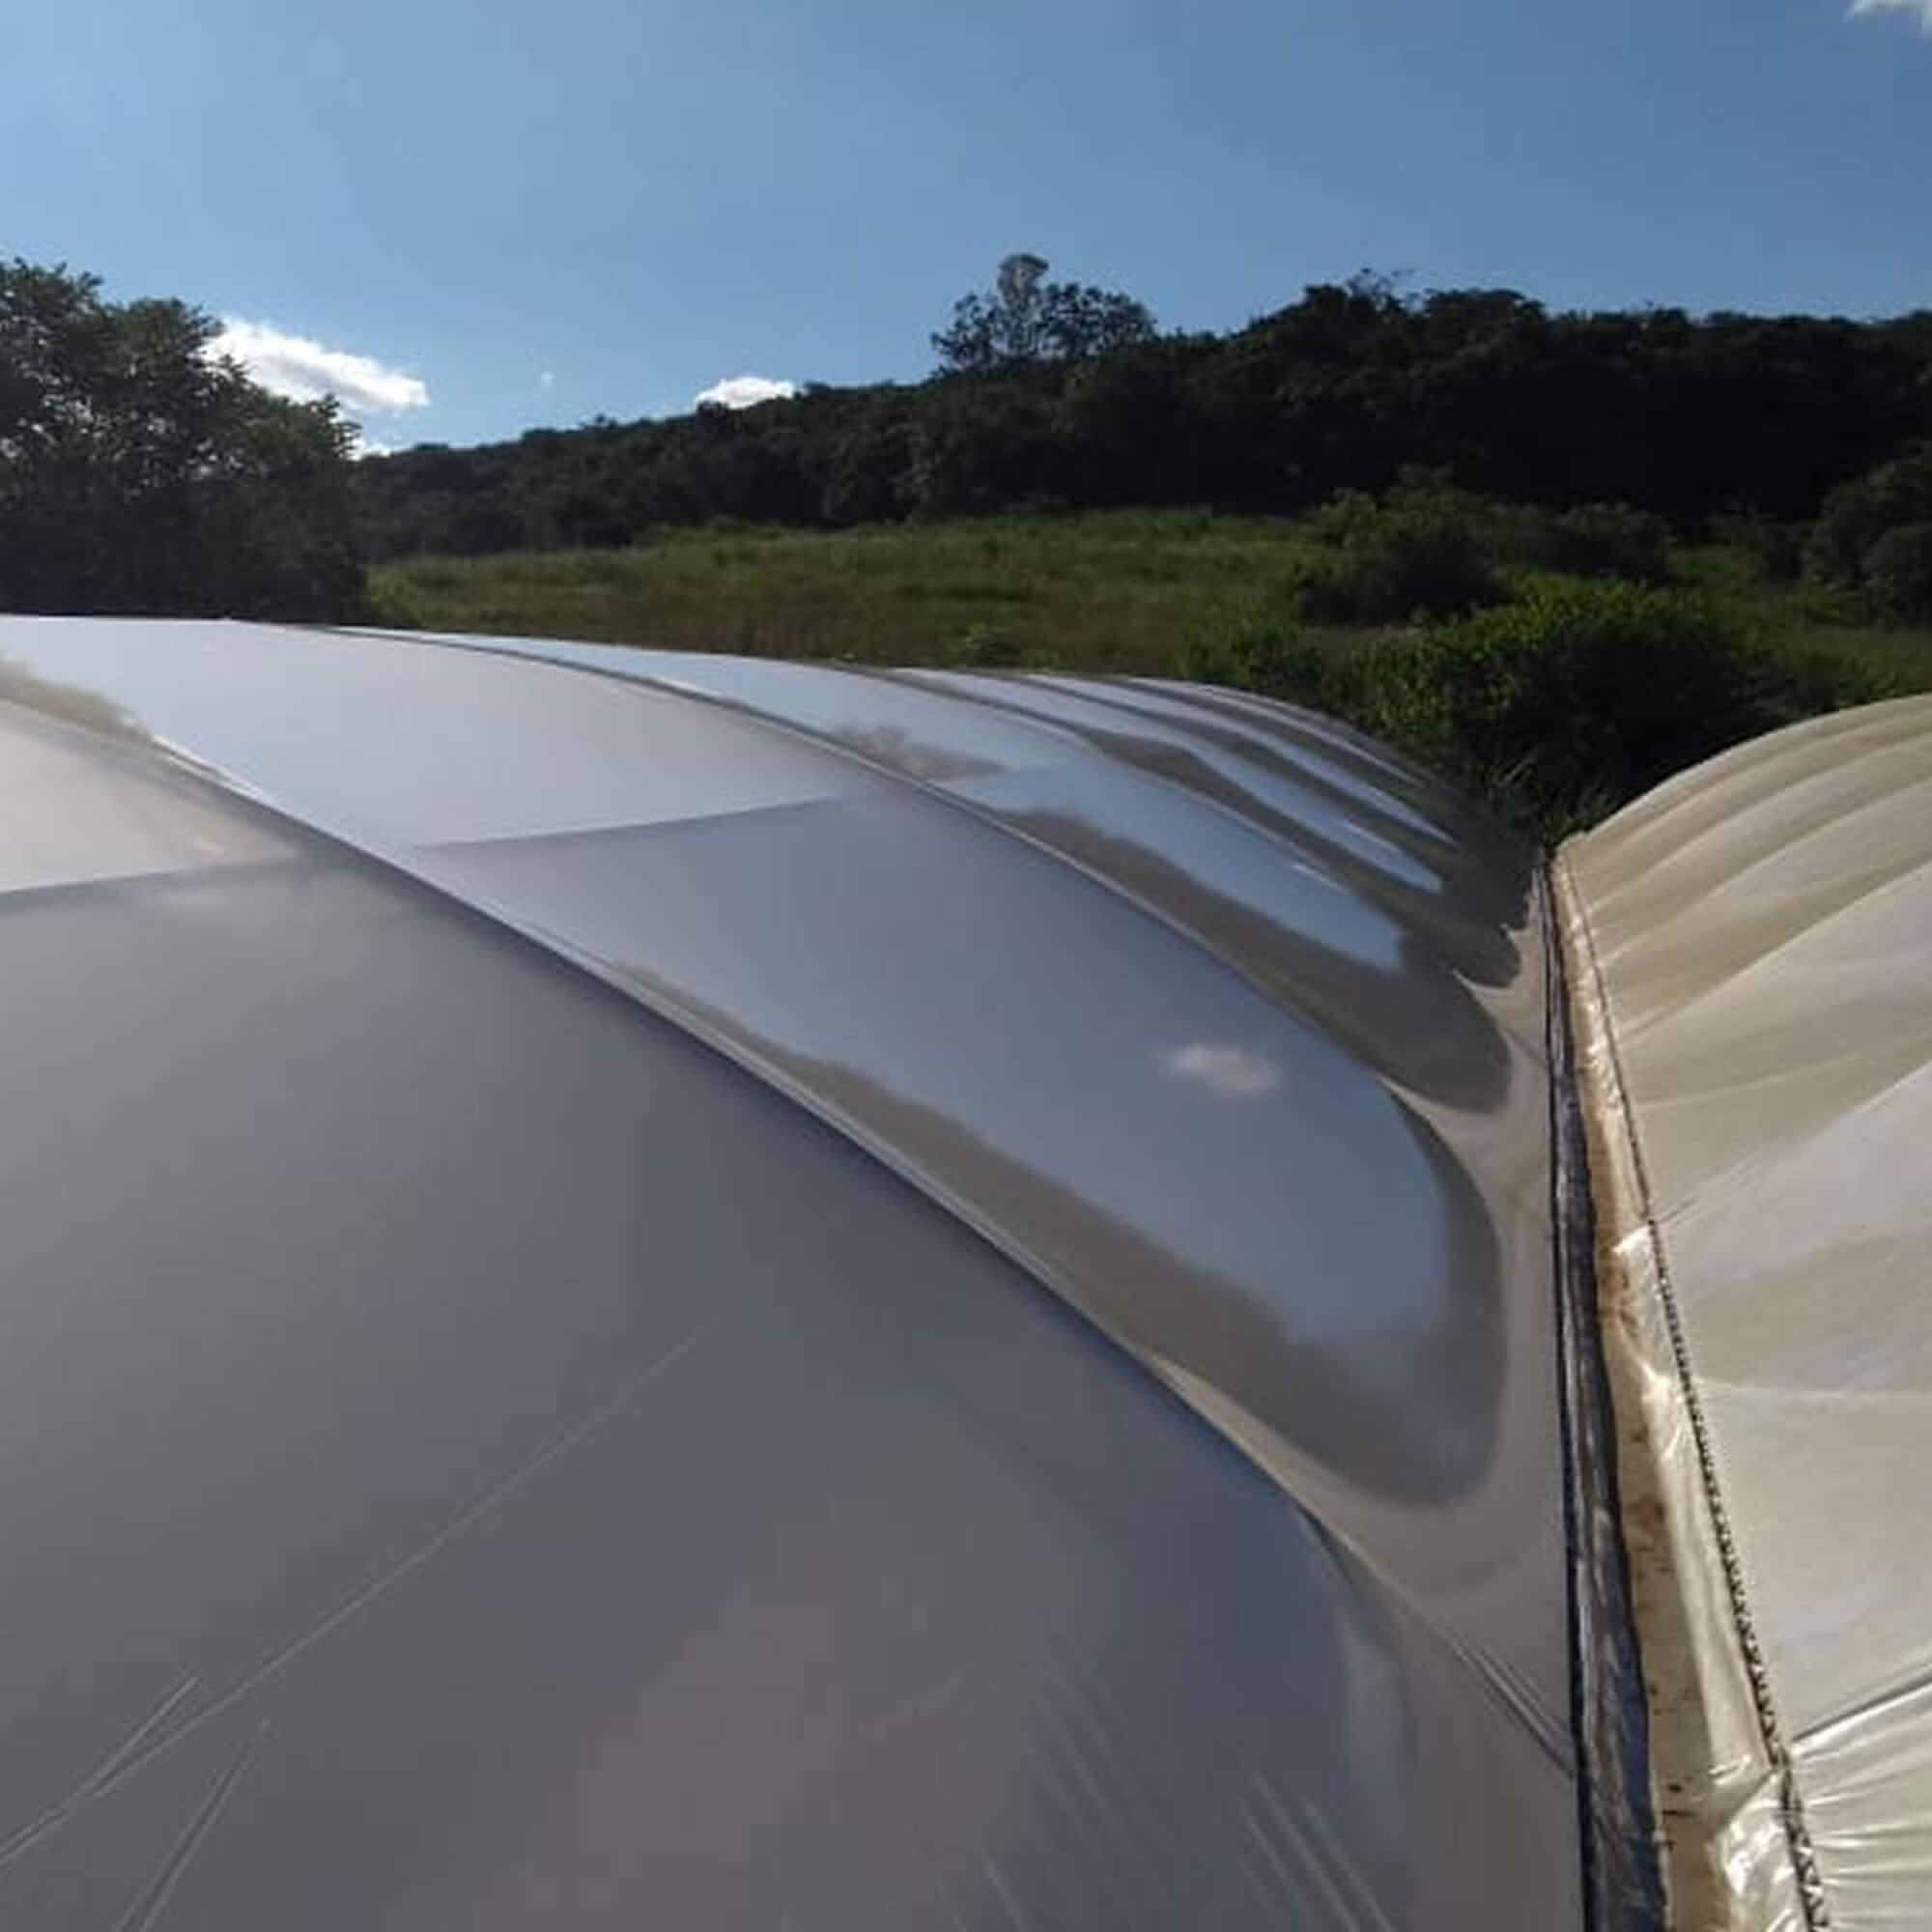 Filme Plástico Difusor para Estufa - 4x100 metros - 90 micras - Politiv